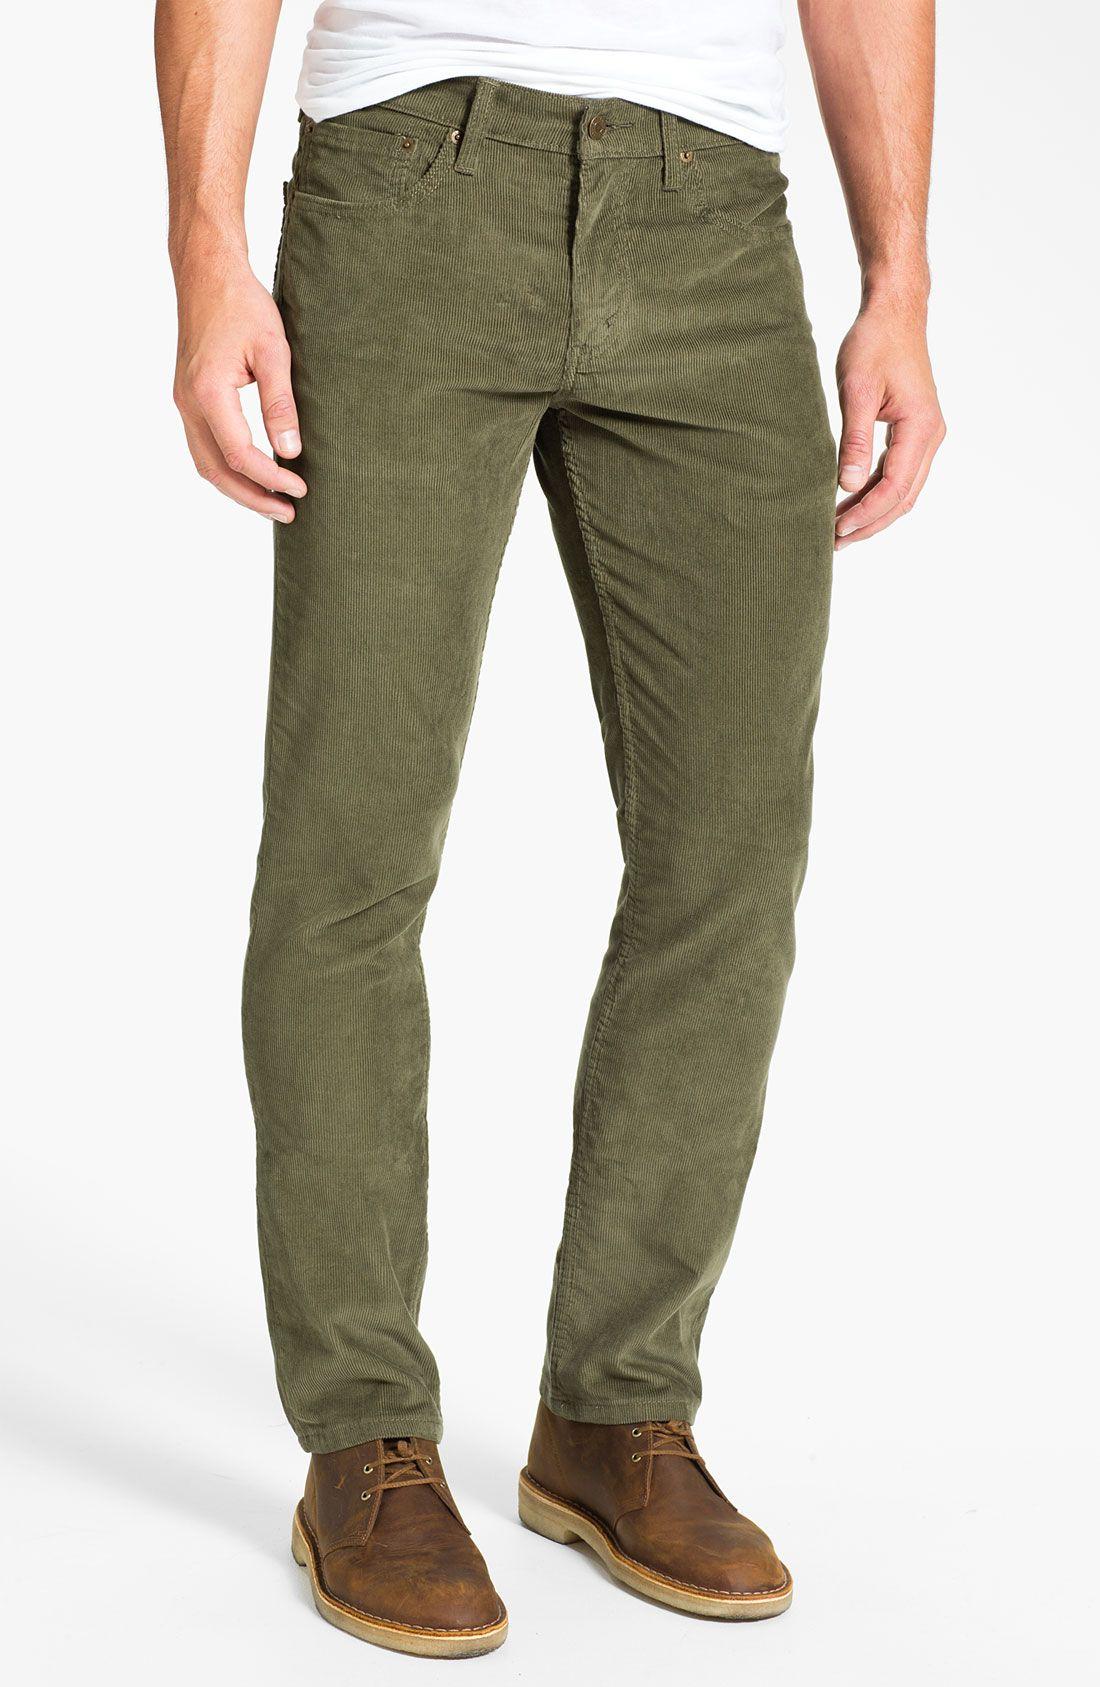 c62332d7 Mens Skinny Corduroy Pants | The Man! | Corduroy pants, Pants, Corduroy